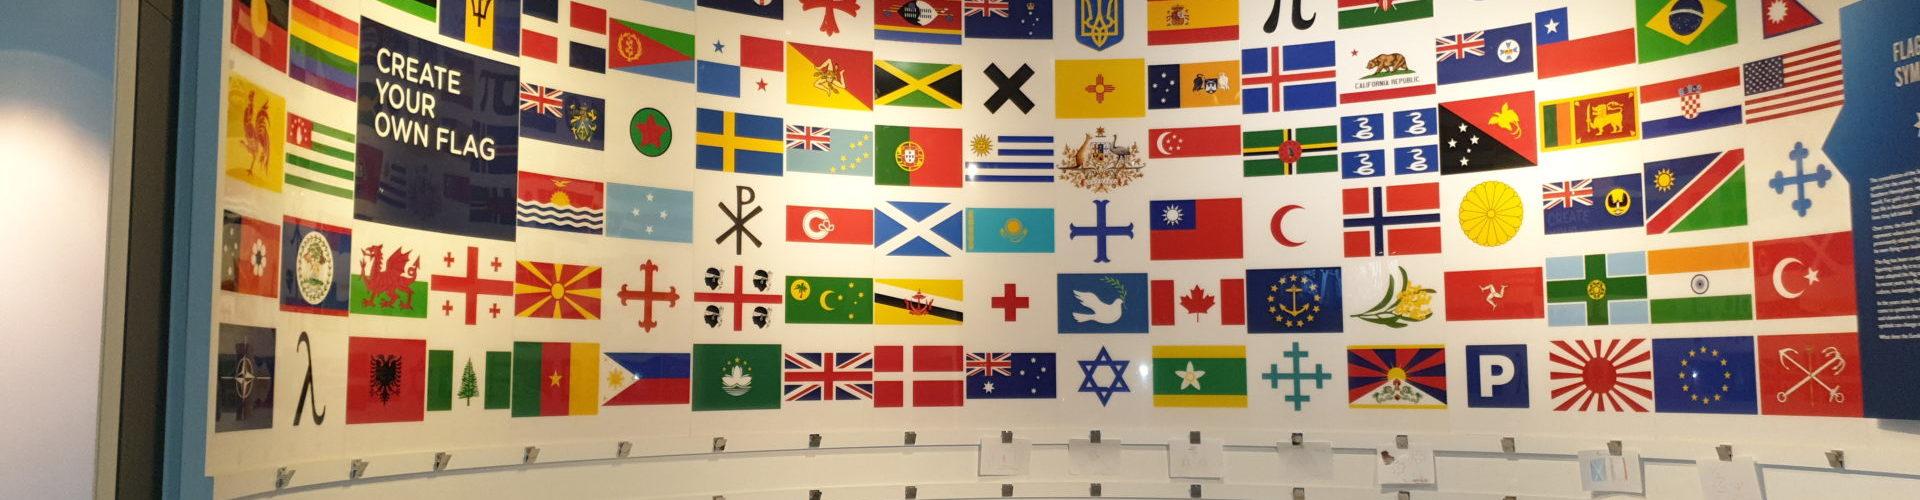 Multi-Nations Flag Gallery, Eureka (M.A.D.E) Museum Ballarat, Victoria, Australia